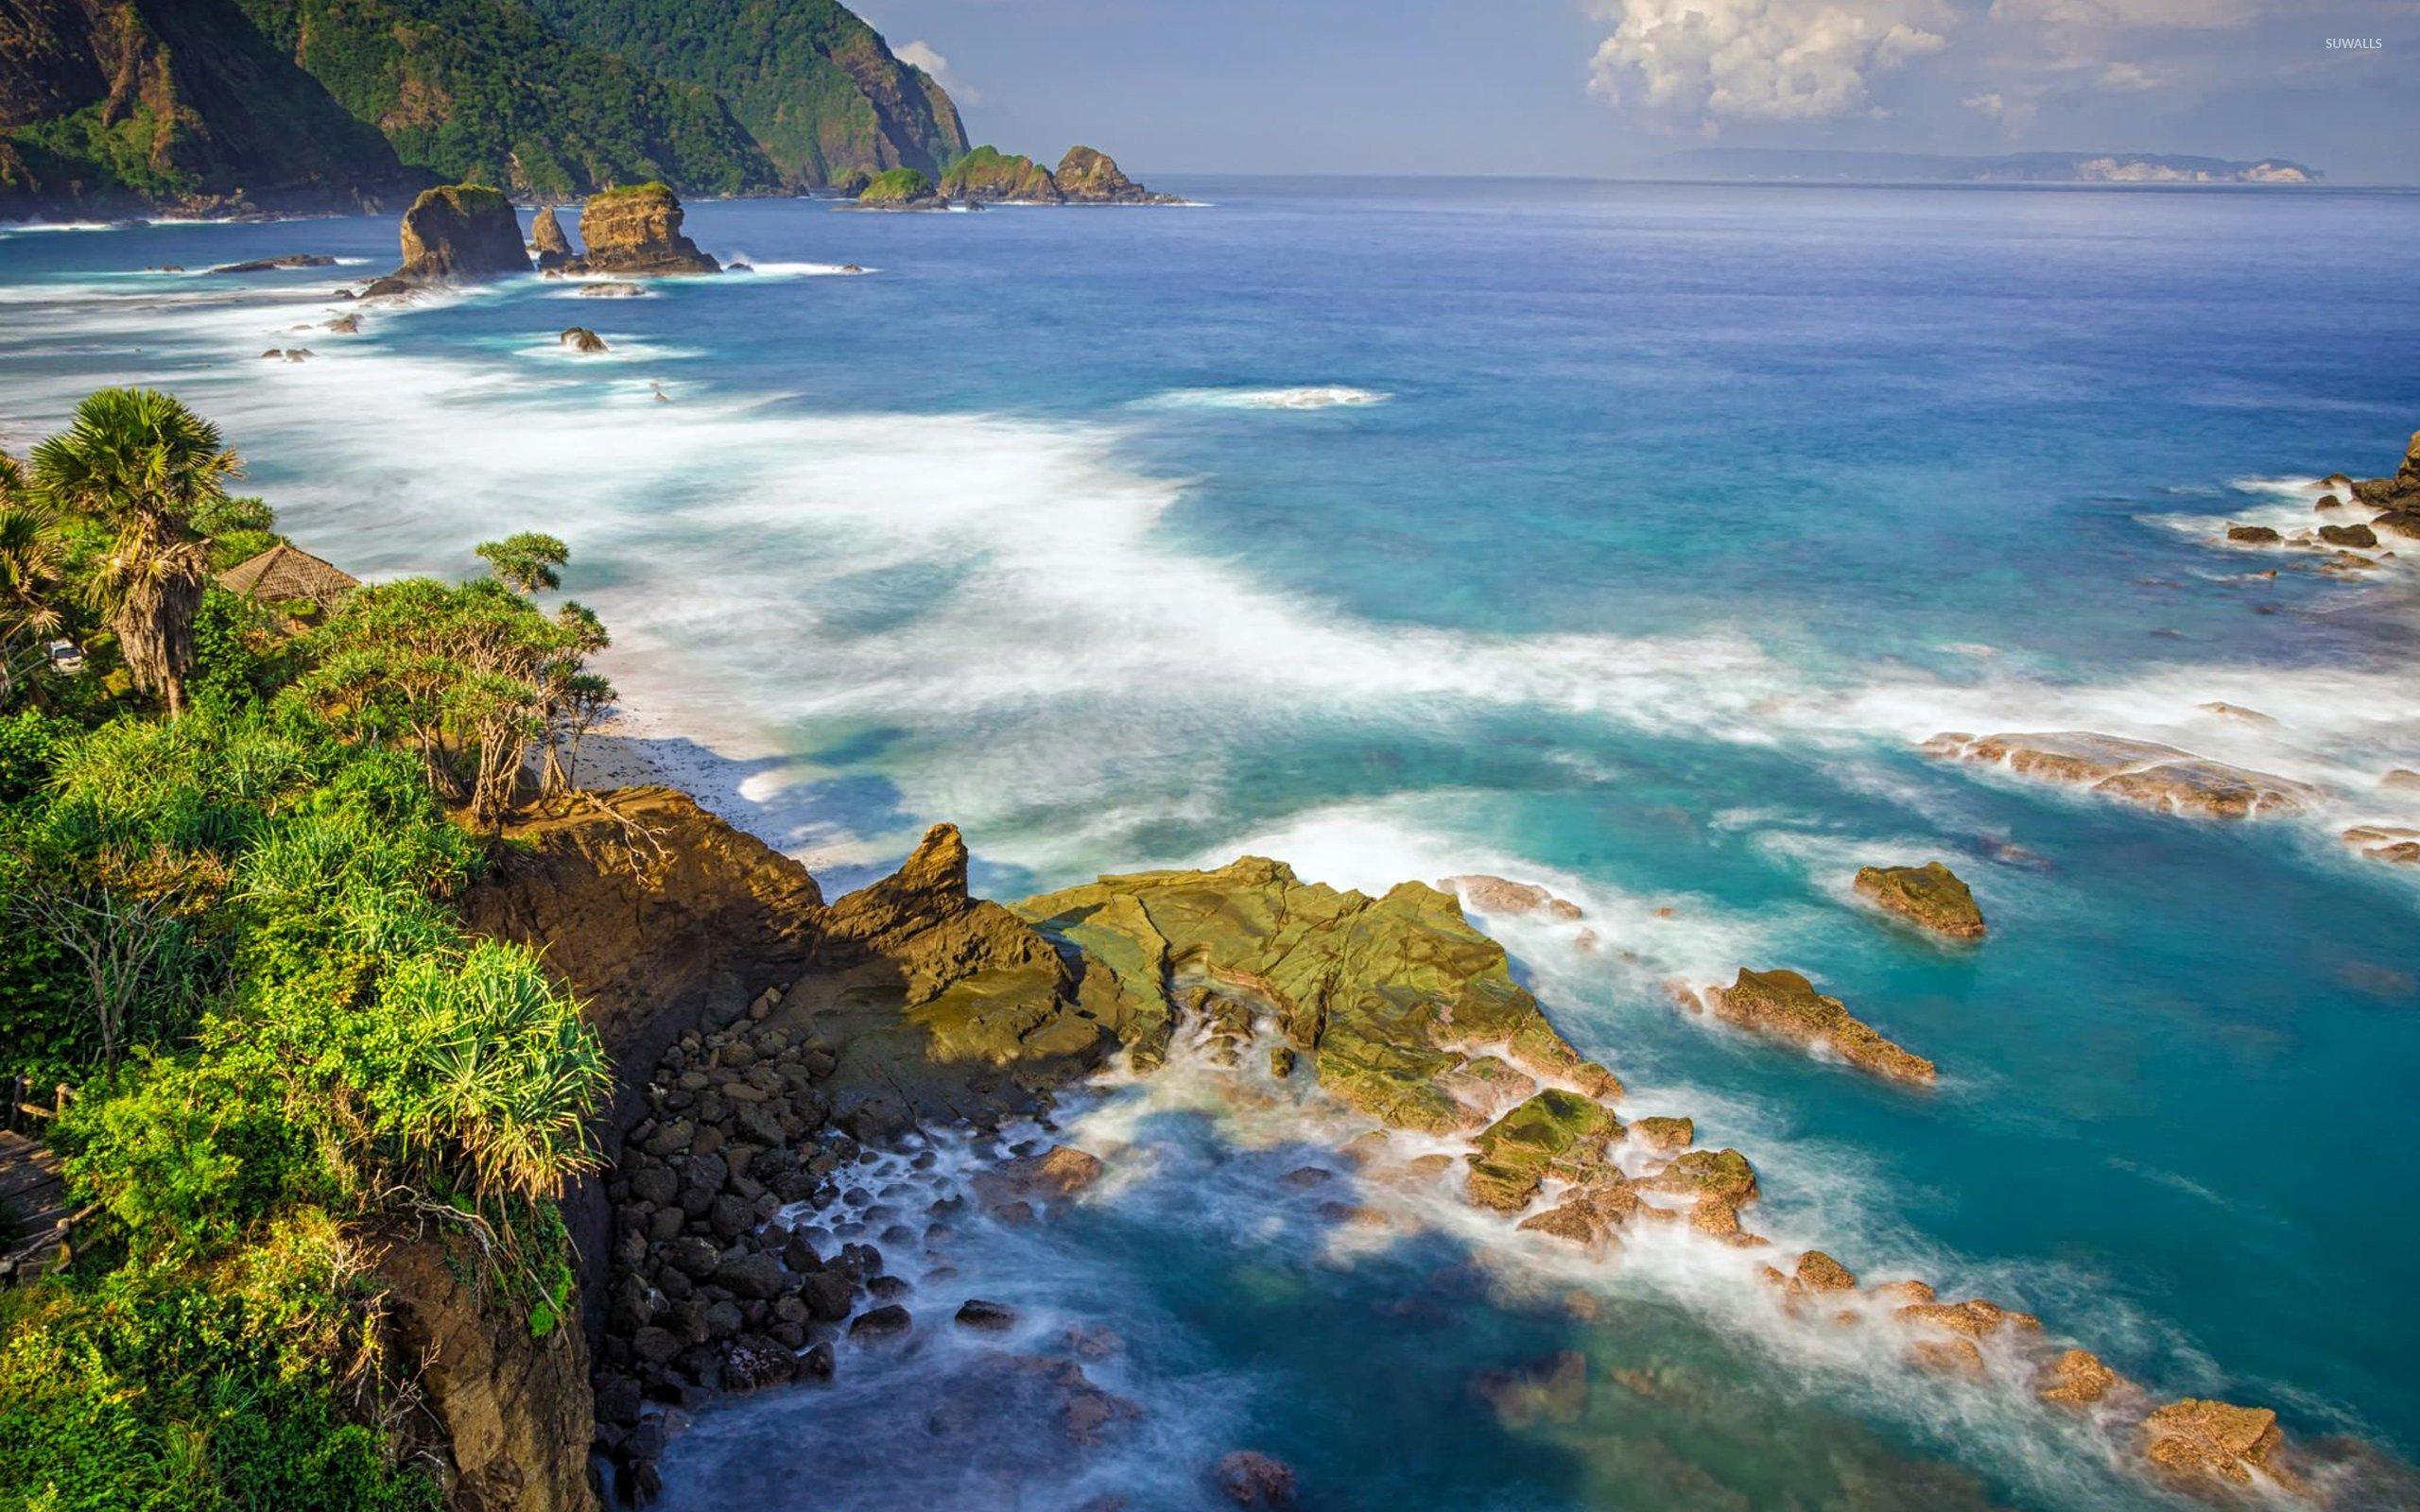 Rocks in the ocean near the exotic island wallpaper 2560x1600